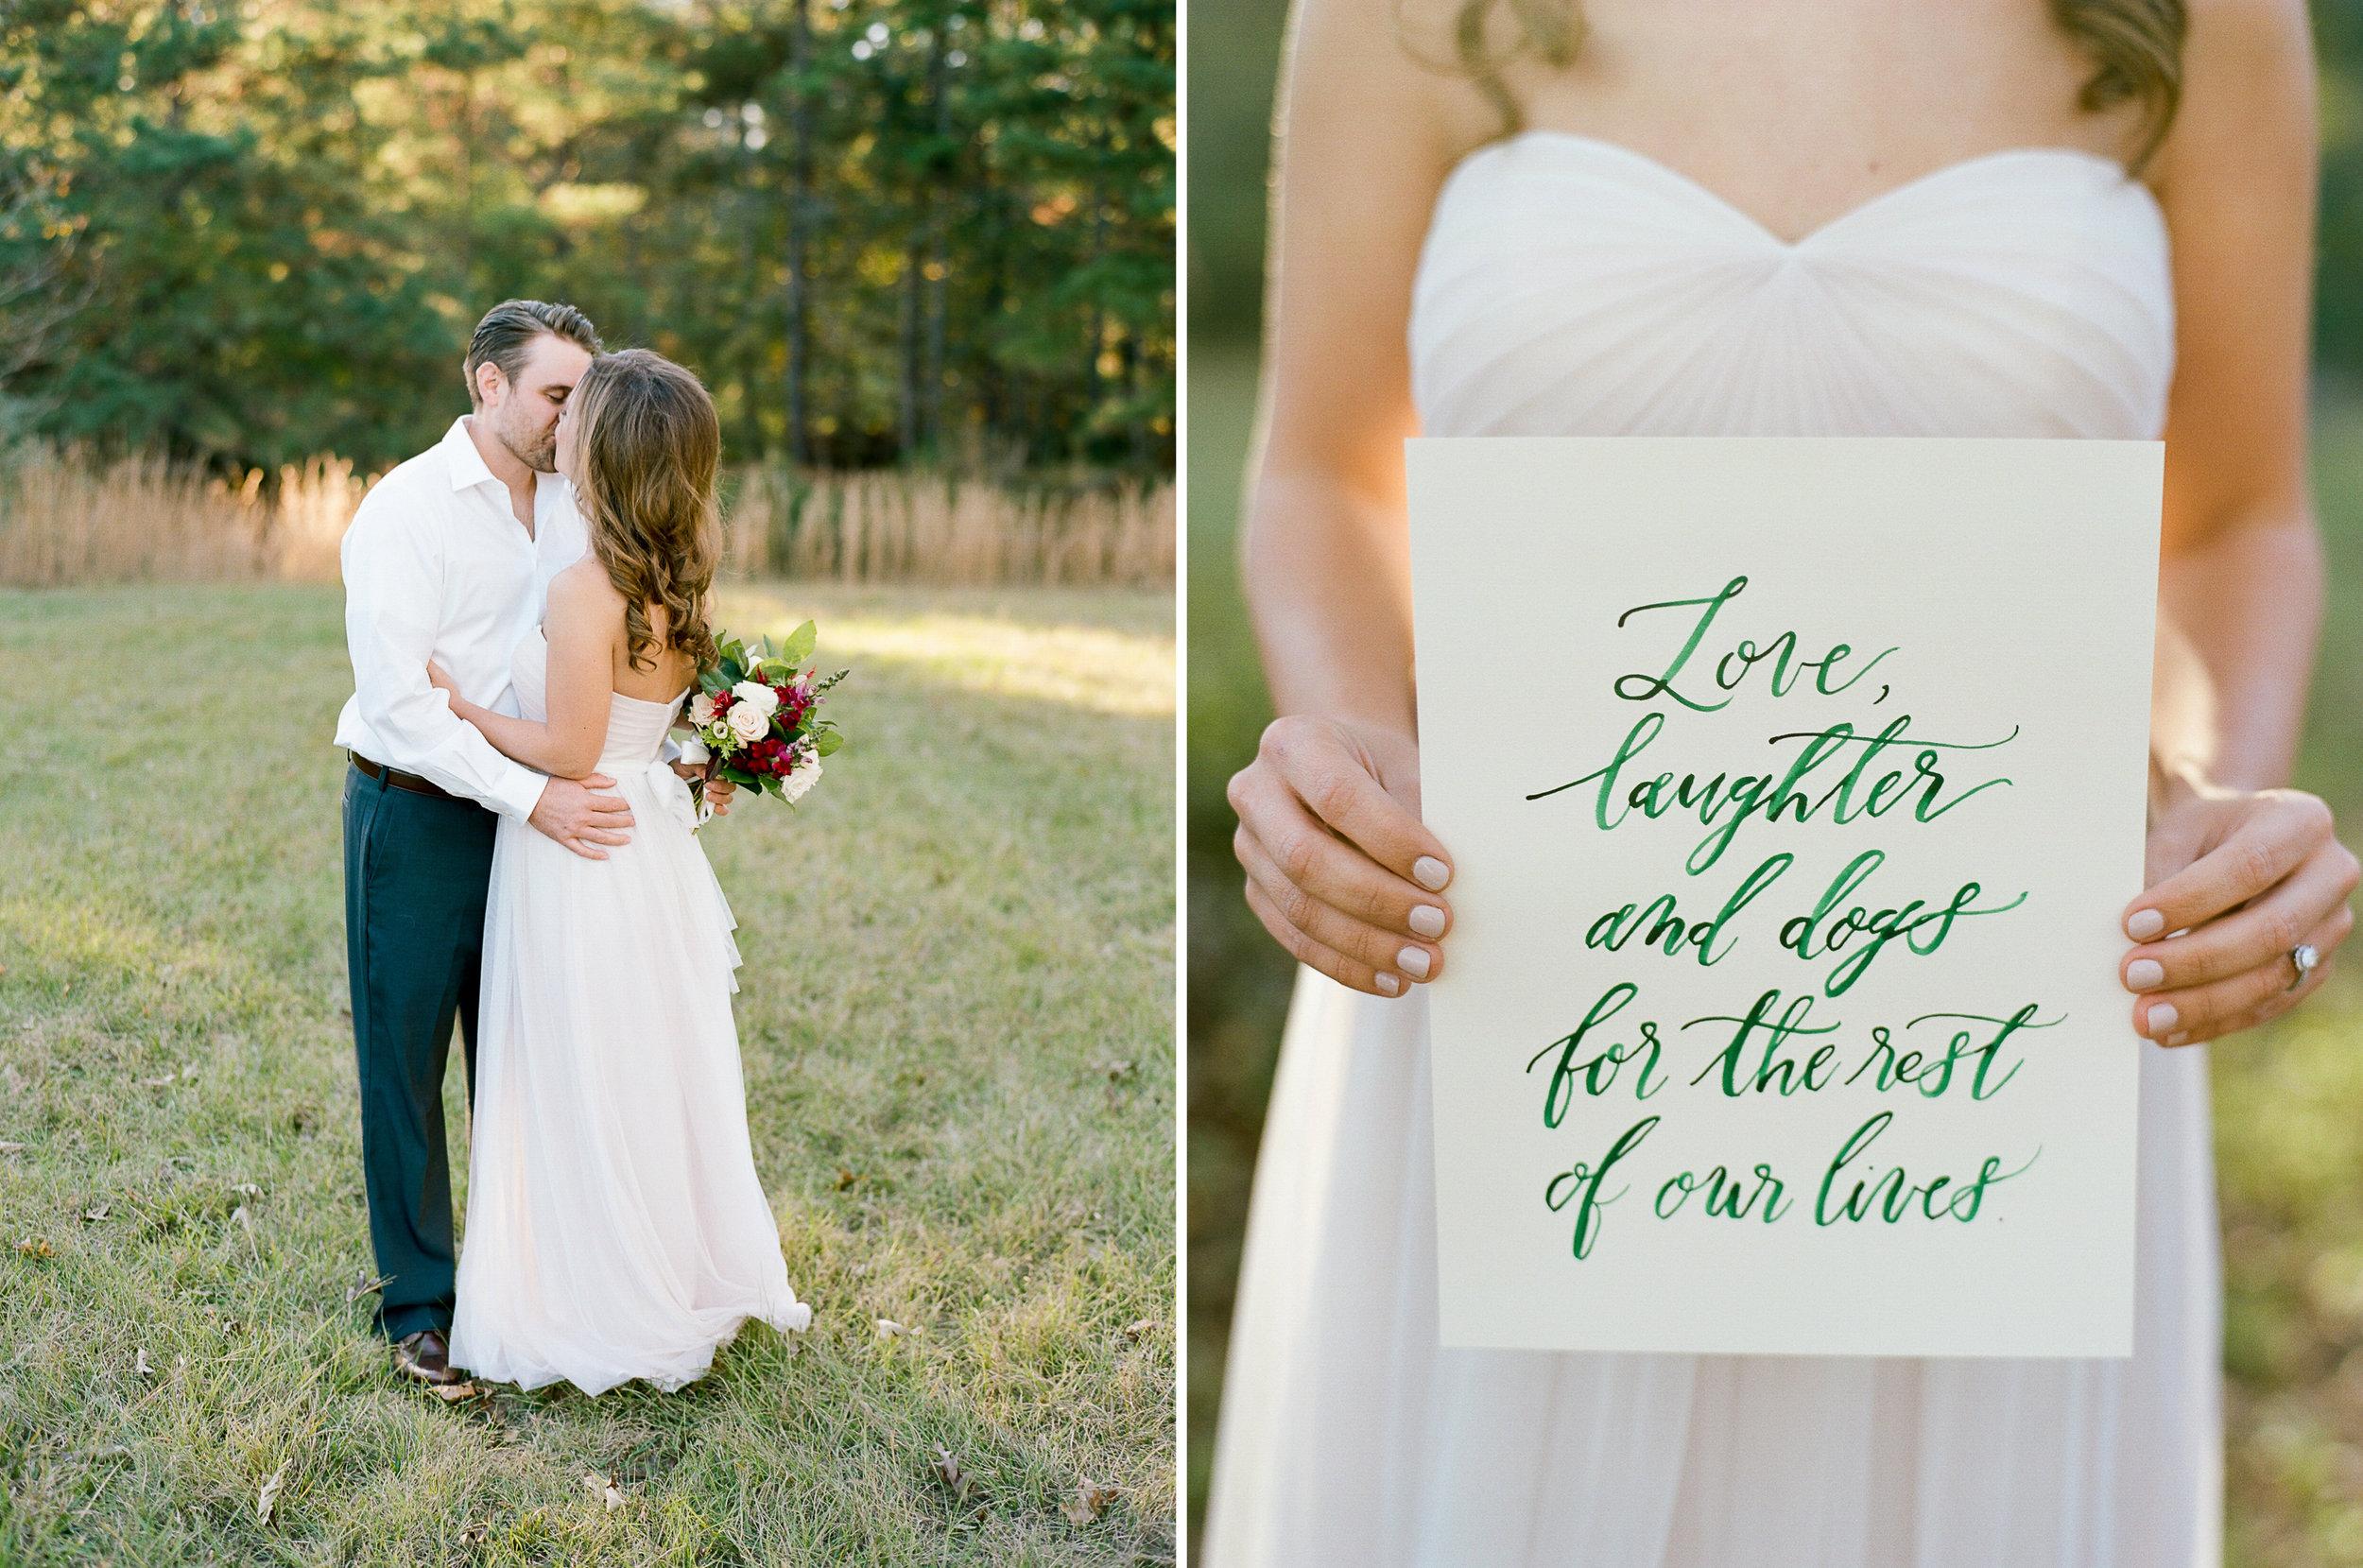 dana-fernandez-photography-houston-wedding-photographer-portraits-engagements-anniversary-session-film-photographer-austin-wedding-photographer-113.jpg